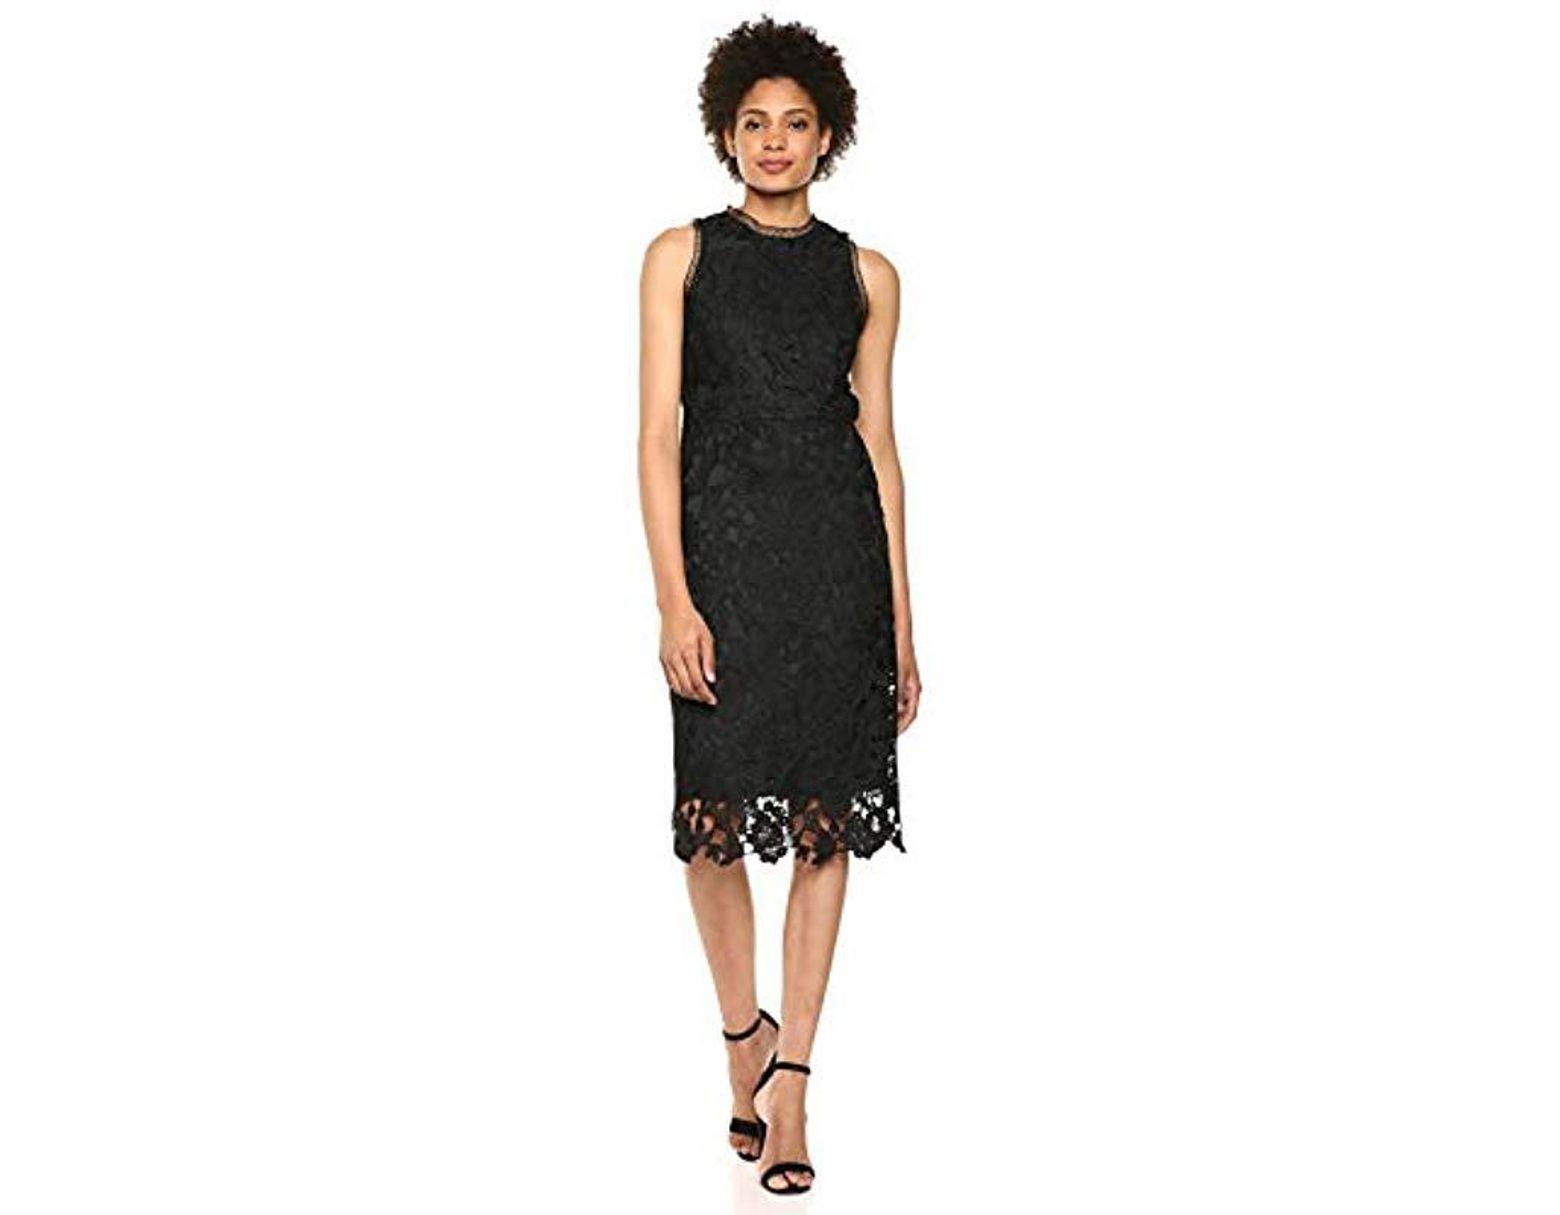 0e6012bdaa7a1 Sam Edelman Sleeveless Peacock Lace High Neck Midi Dress in Black - Lyst